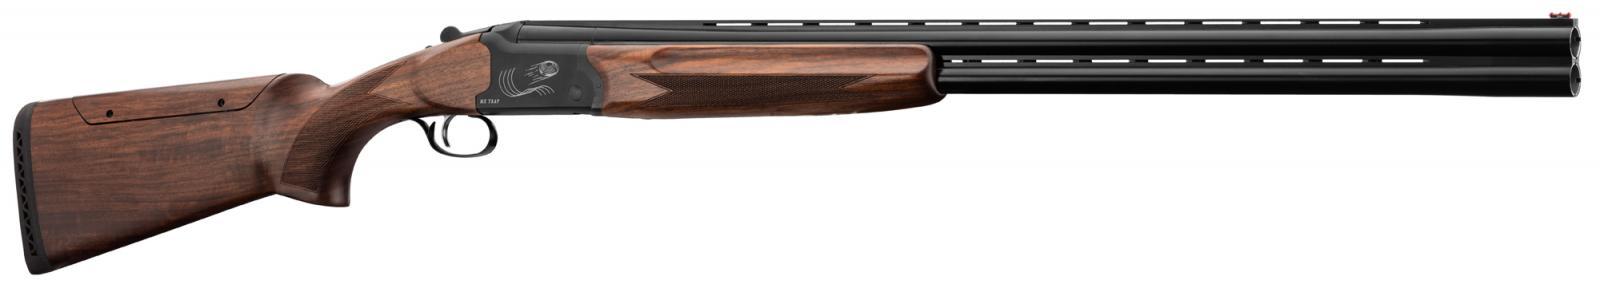 Fusil YILDIZ MX trap MC151 Cal. 12/70